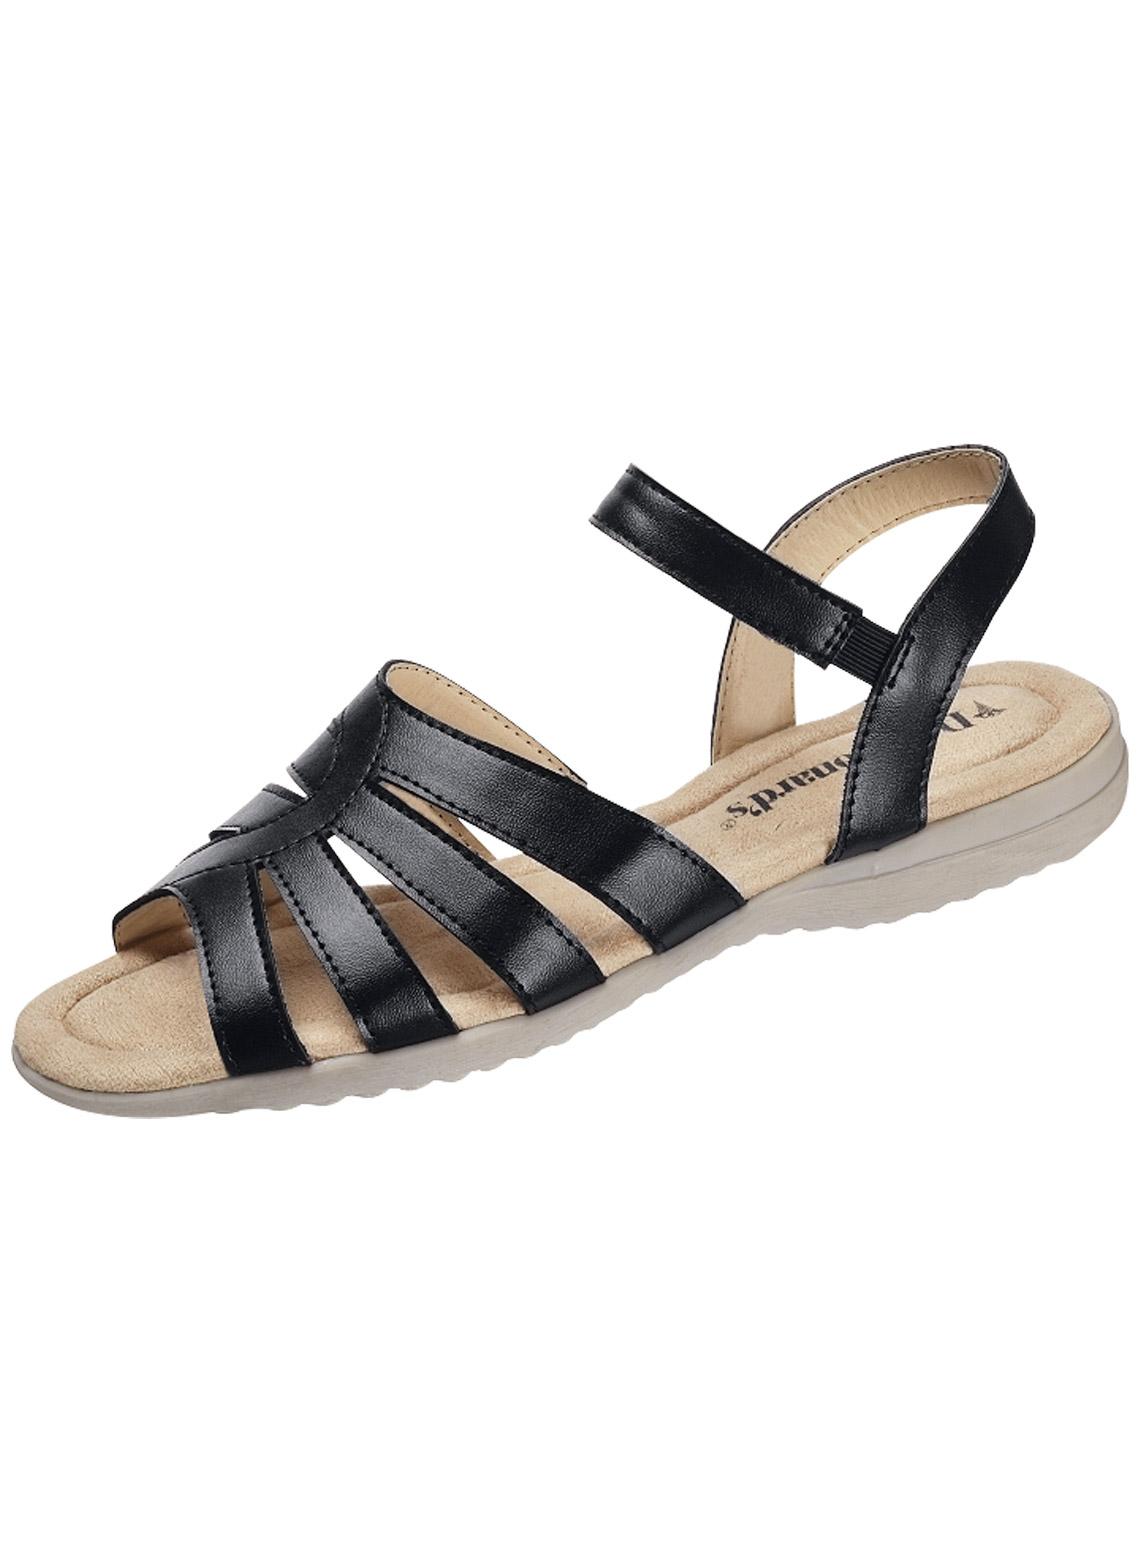 womens sandals dr. leonardu0027s womenu0027s strappy sandal. loading zoom medkuqh